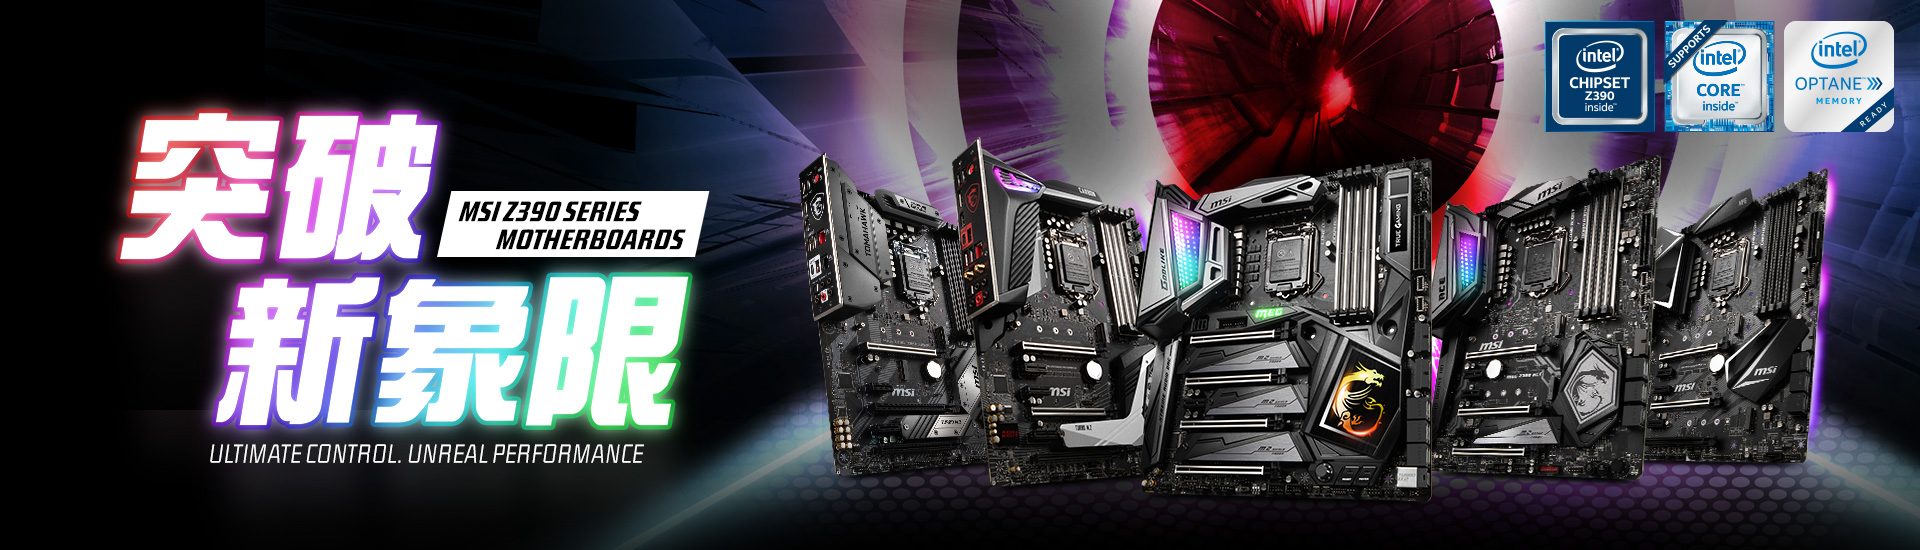 z390 series